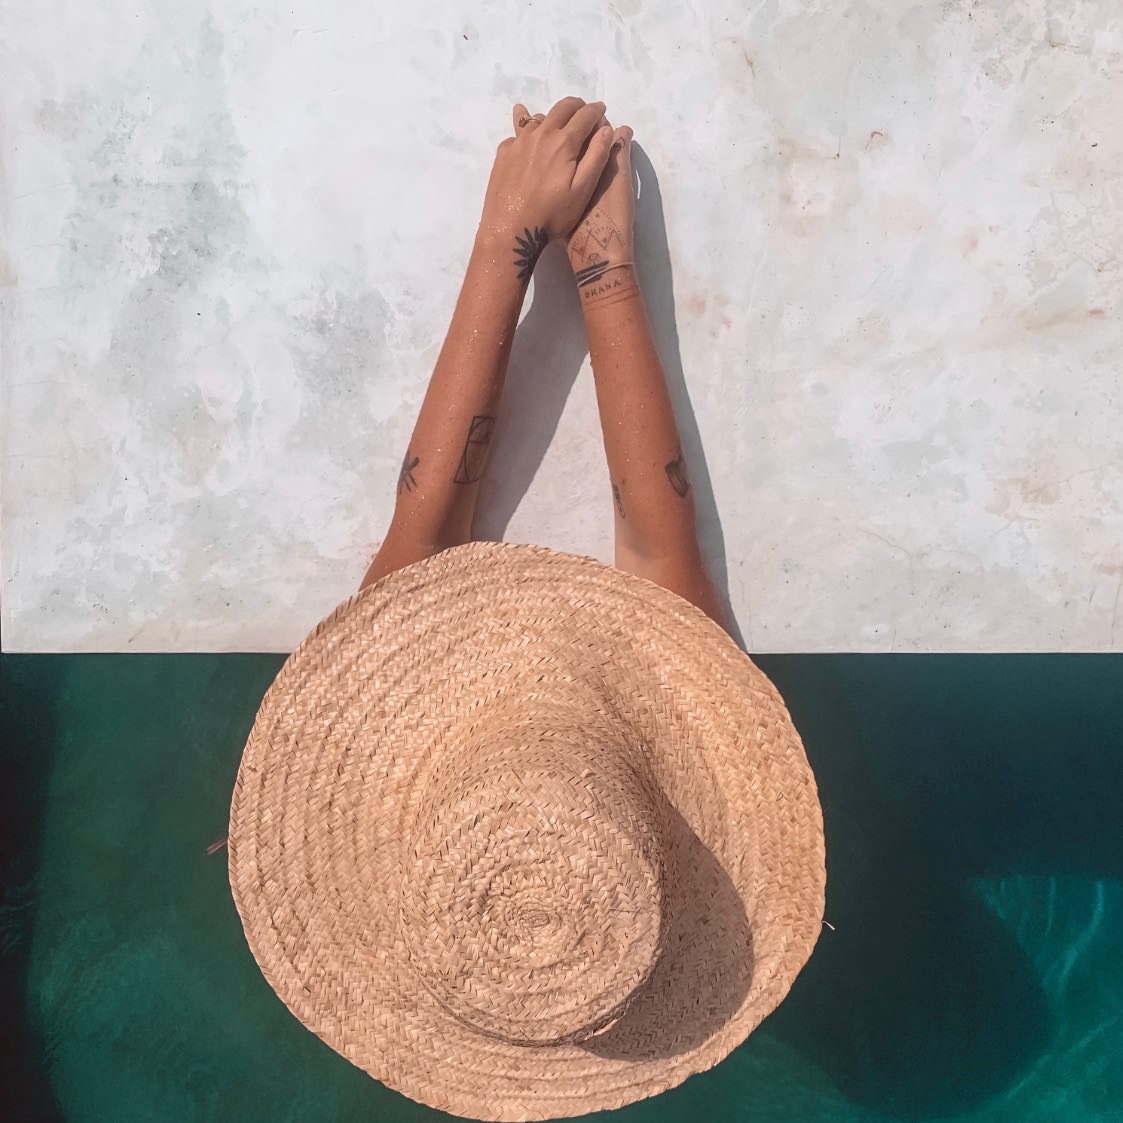 earthlinks srilanka pool area water hat girl.jpg